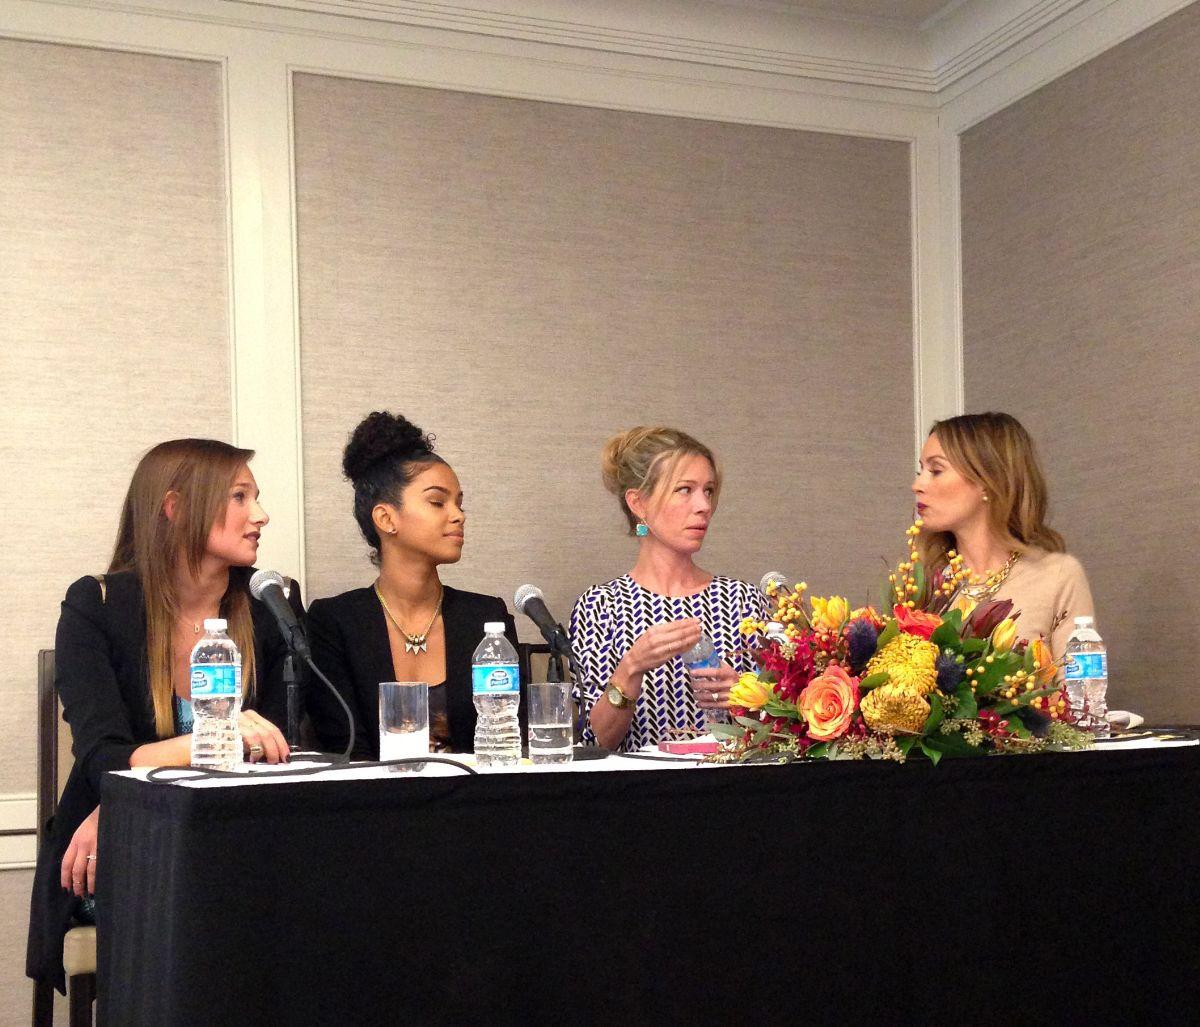 Danielle Bernstein, Alba Garcia, Jordan Reid, simply stylist, nyc